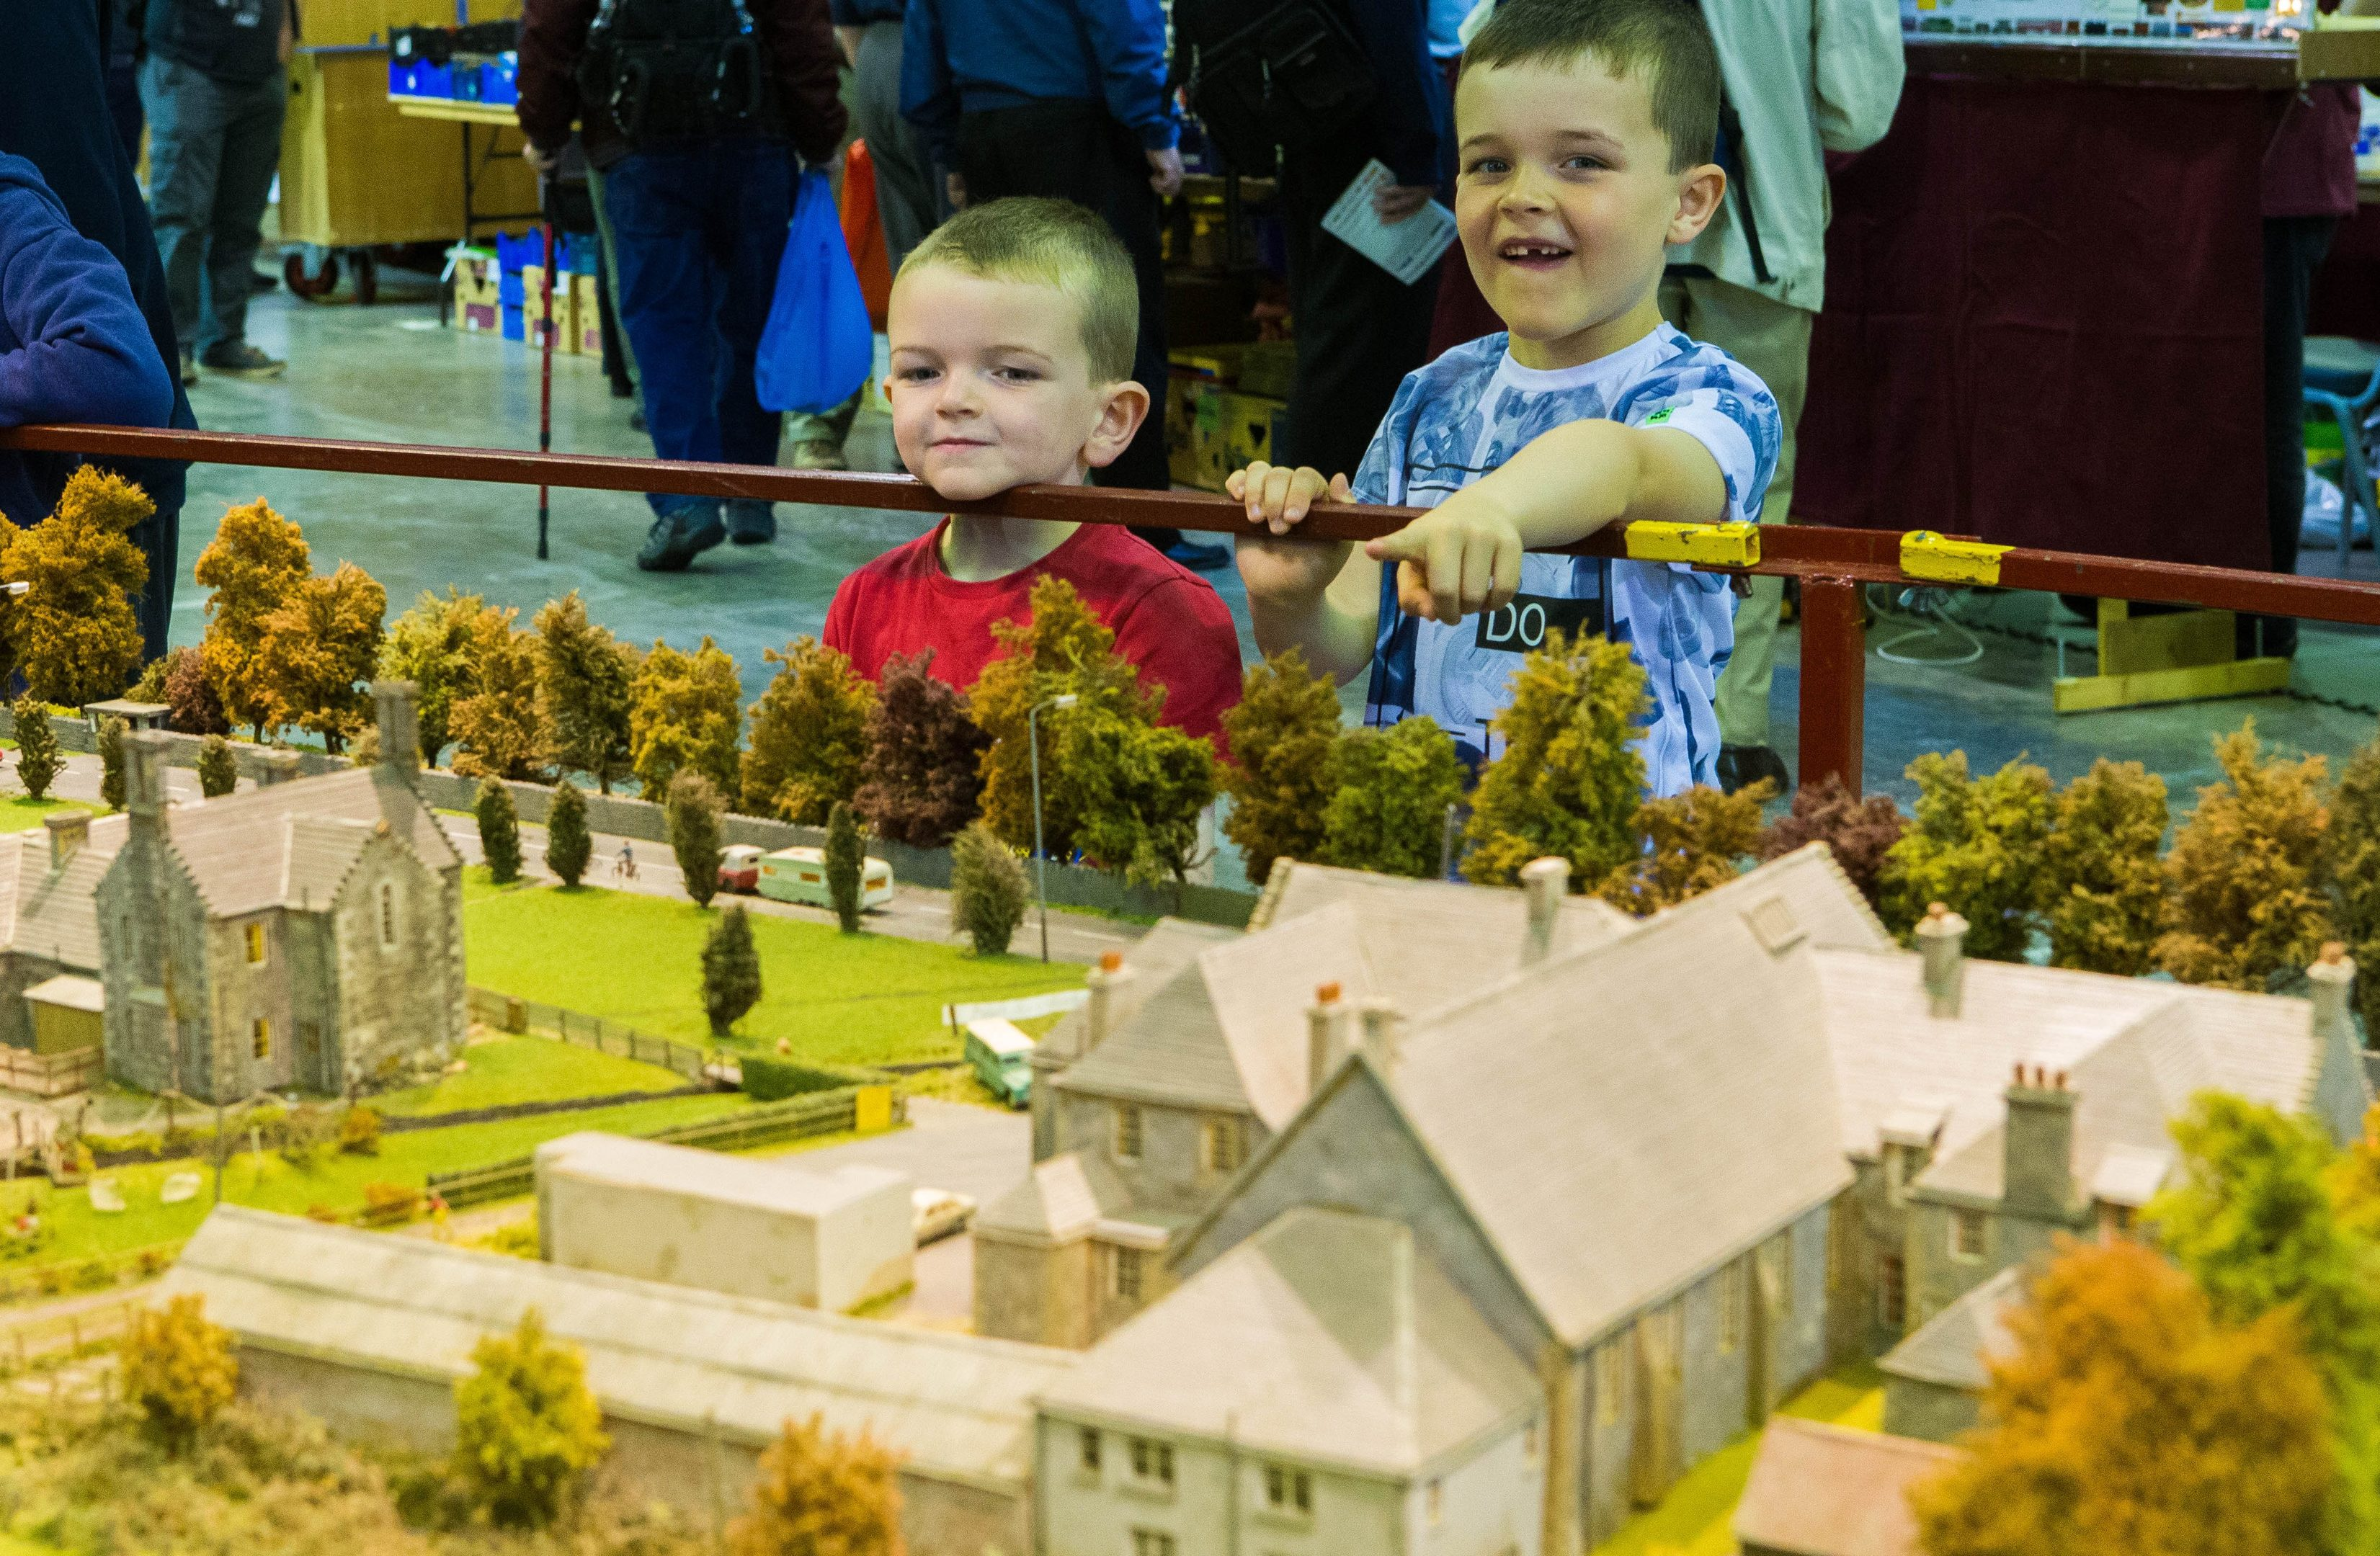 Conlan Turner (5) is shown the Blair Atholl rail model by brother Bryn Turner (6).